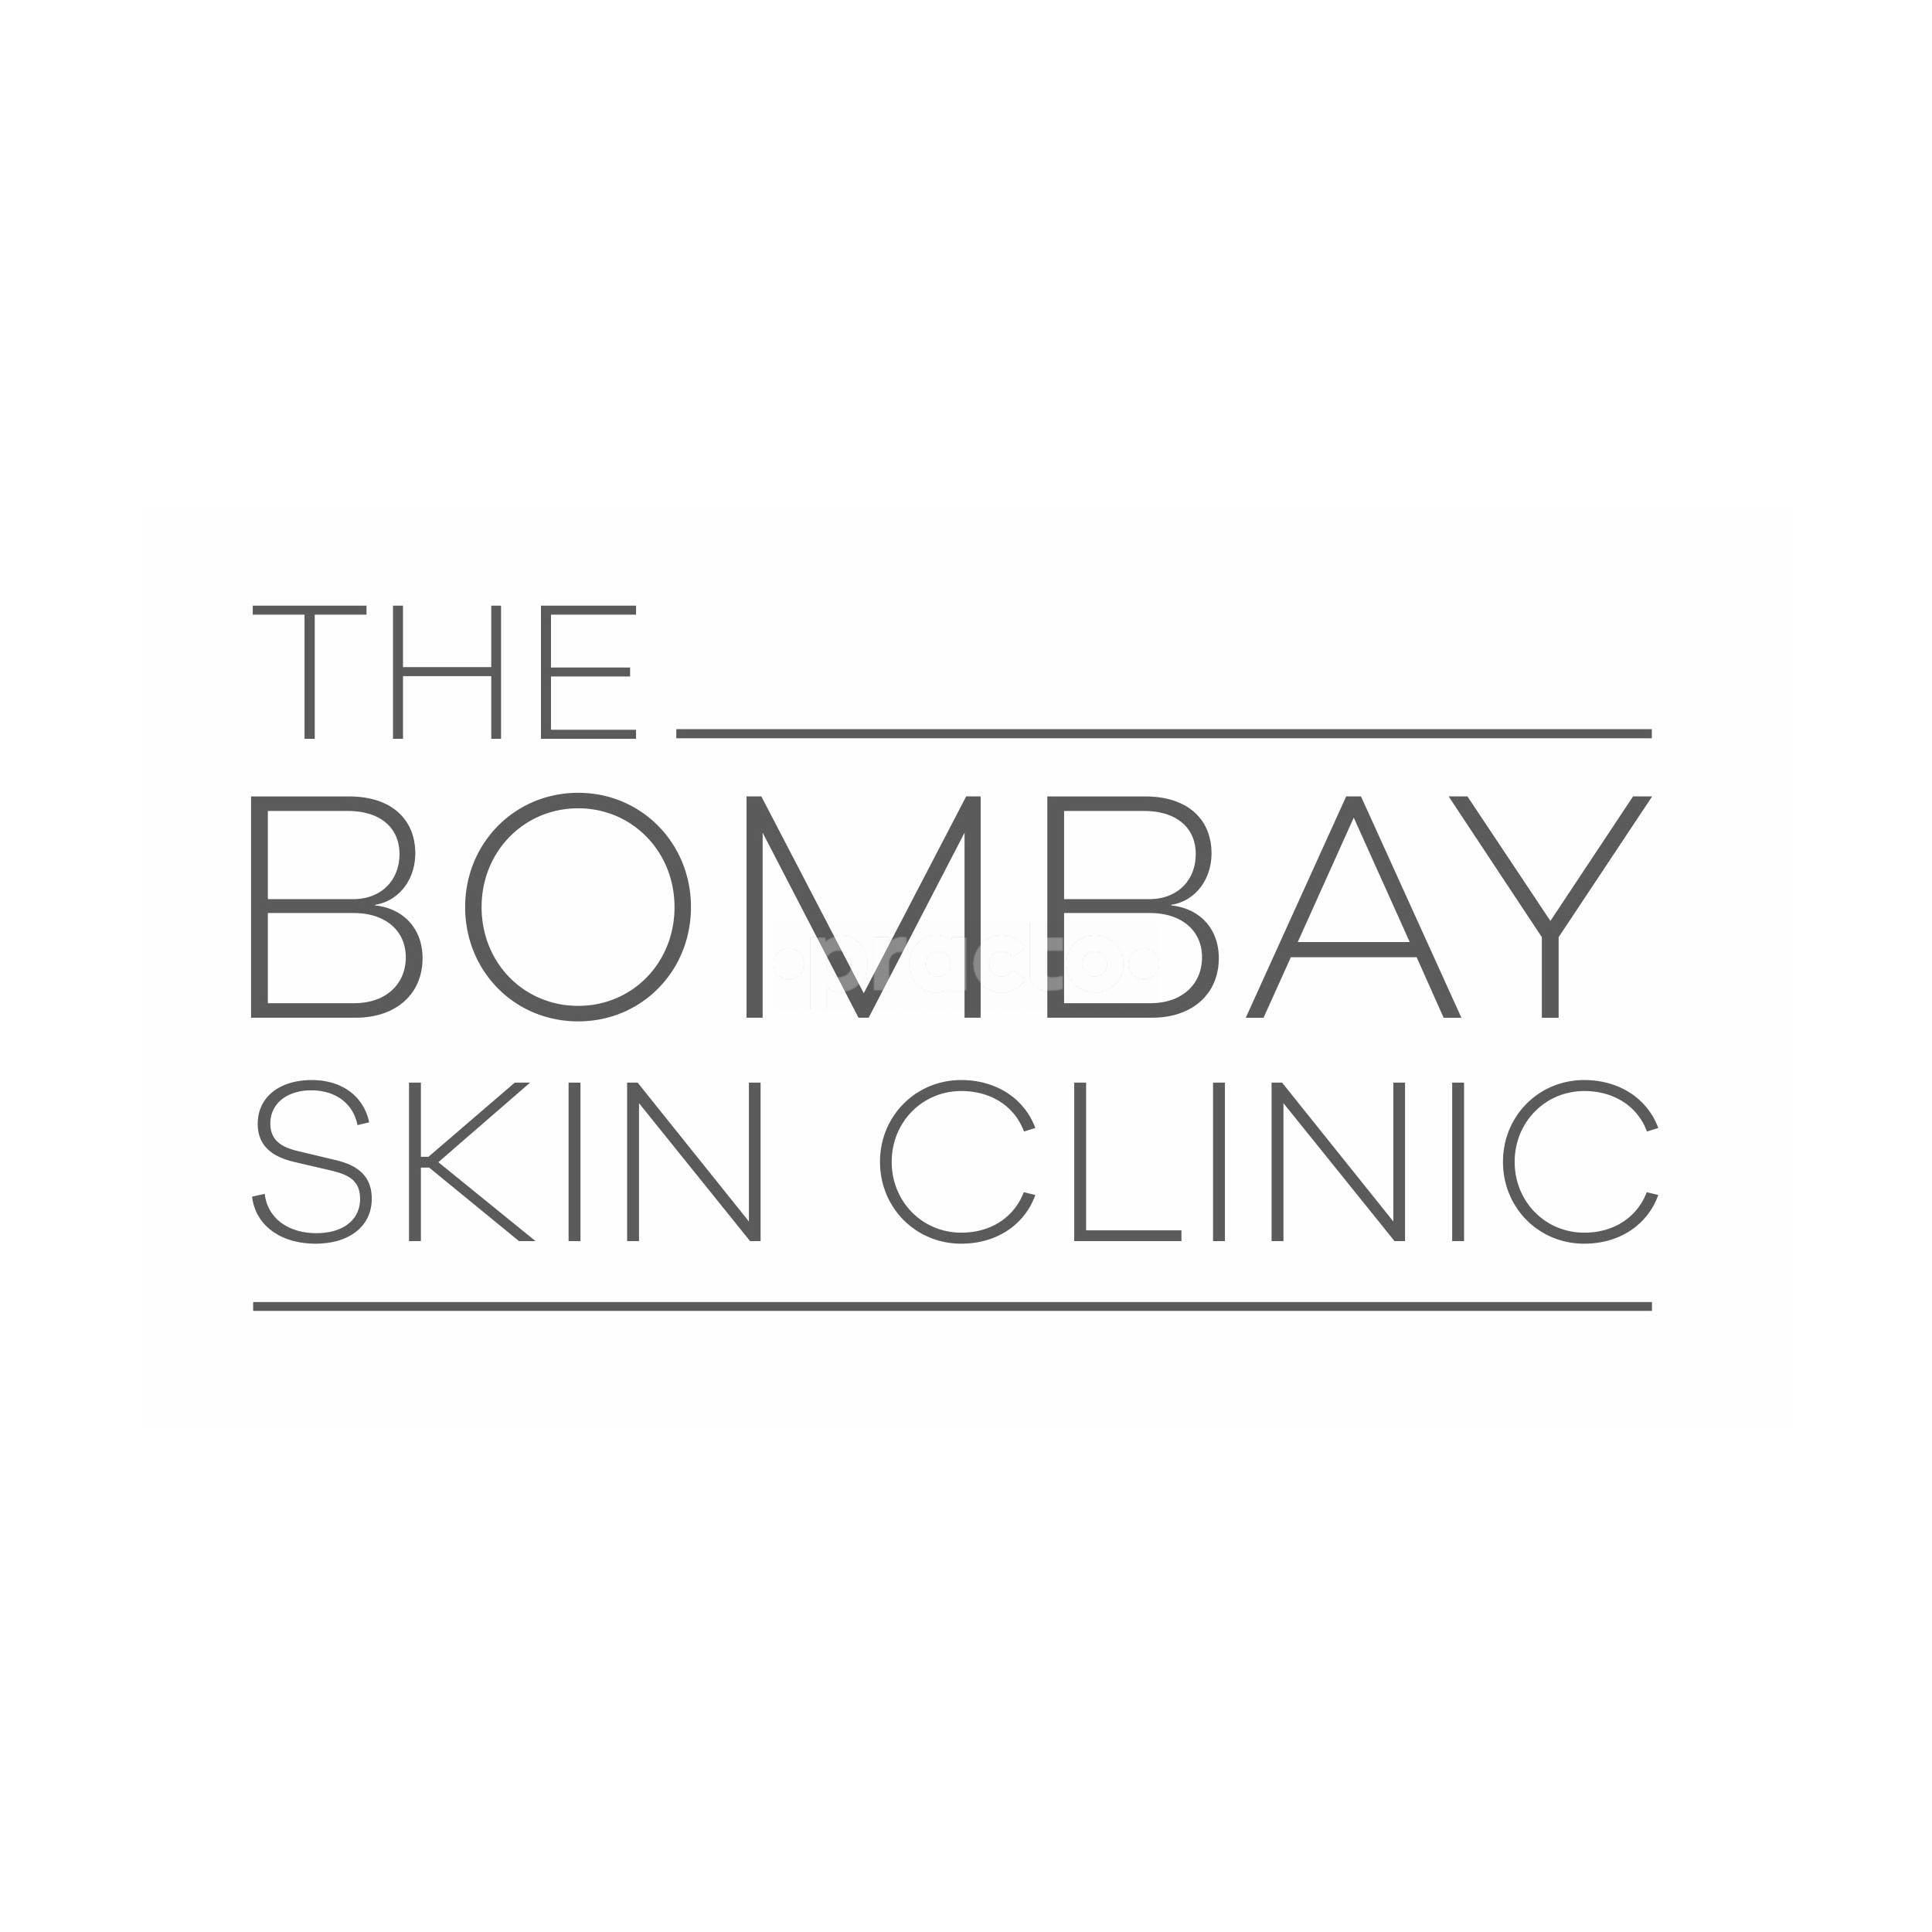 The Bombay Skin Clinic